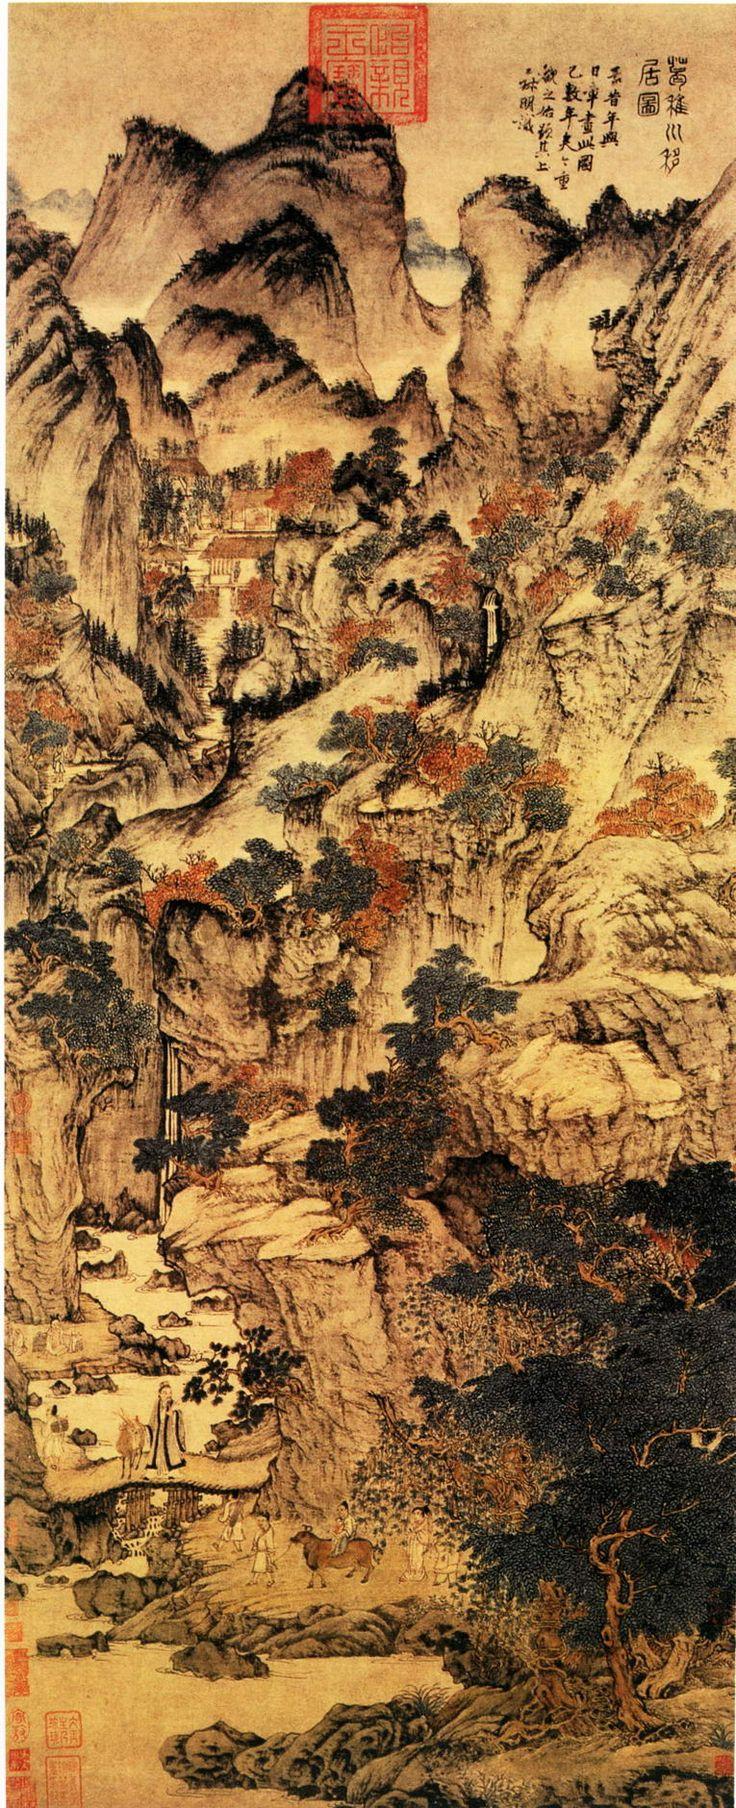 Wang Meng(王蒙) ,  Ge Zhichuan Relocating (葛稚川移居图), Palace Museum, Beijing , 葛稚川移居图 北京故宫博物院藏. 元代道教盛行,表现道教题材的绘画作品为数众多,此图描绘的是晋代著名道士葛洪携家移居罗浮山修道的故事,截取了葛洪在移居路上的一段情景。画面以山水为主体,重山复岭,丹柯碧树,飞瀑溪潭,茅亭草舍,一派深秋山林佳境。全画构图繁复,但层次井然,飞瀑、山径引导观者的视线层层深入,使画面气脉贯通,虽满而不迫塞。图中山石纯用水墨,皴擦点染兼参,干湿浓淡互用,勾画缜密,而树木、人物、屋宇则施以赭石、藤黄、花青,设色沉稳浑厚,极富古雅的韵致。整个画面谨严、深秀,创造出一幅理想的隐居环境。王蒙与葛洪虽然年代相隔久远且身份迥异,但在许多方面却有着相同之处:二人皆出自名门,都欲入世作官,却均遭世弃,最终都选择了避世隐居。此图是反映王蒙避世隐居思想的最具代表性的作品。